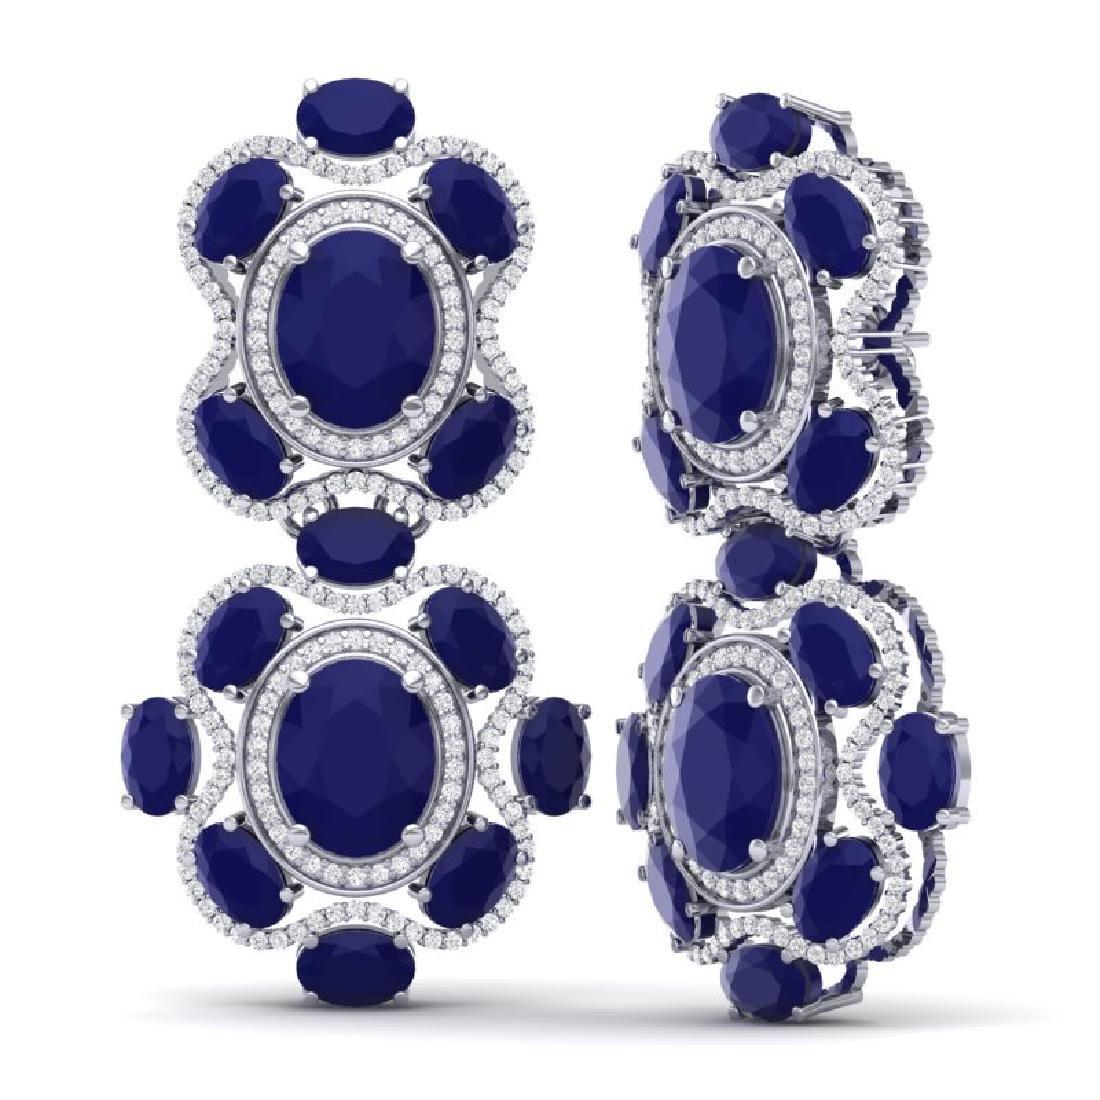 33.5 CTW Royalty Sapphire & VS Diamond Earrings 18K - 3